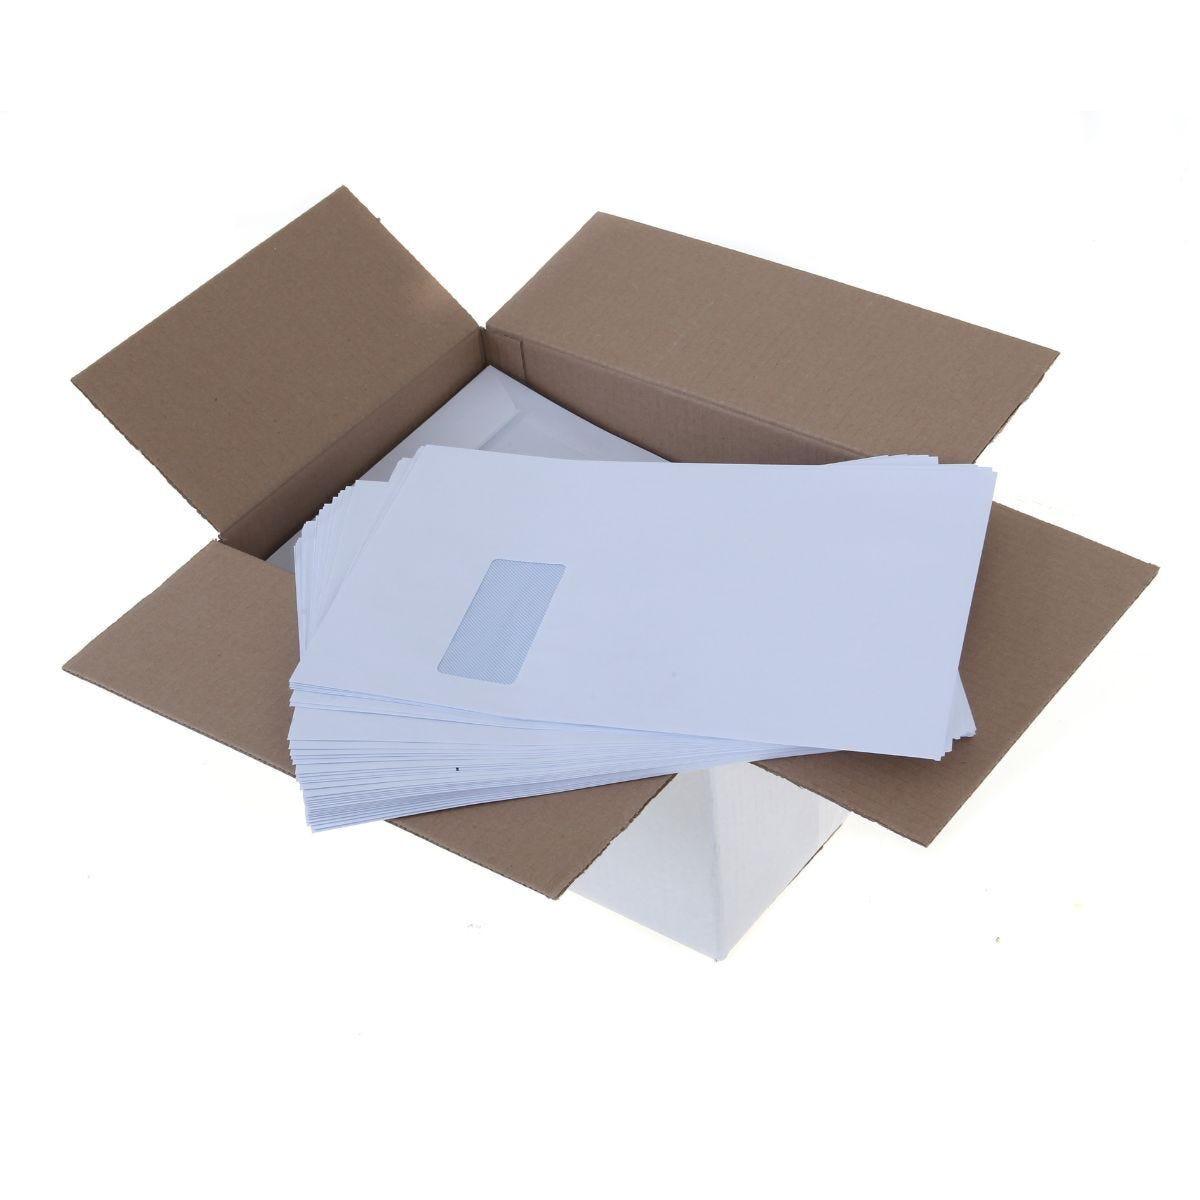 Ryman Window Envelopes C4 90gsm Peel and Seal Box of 250